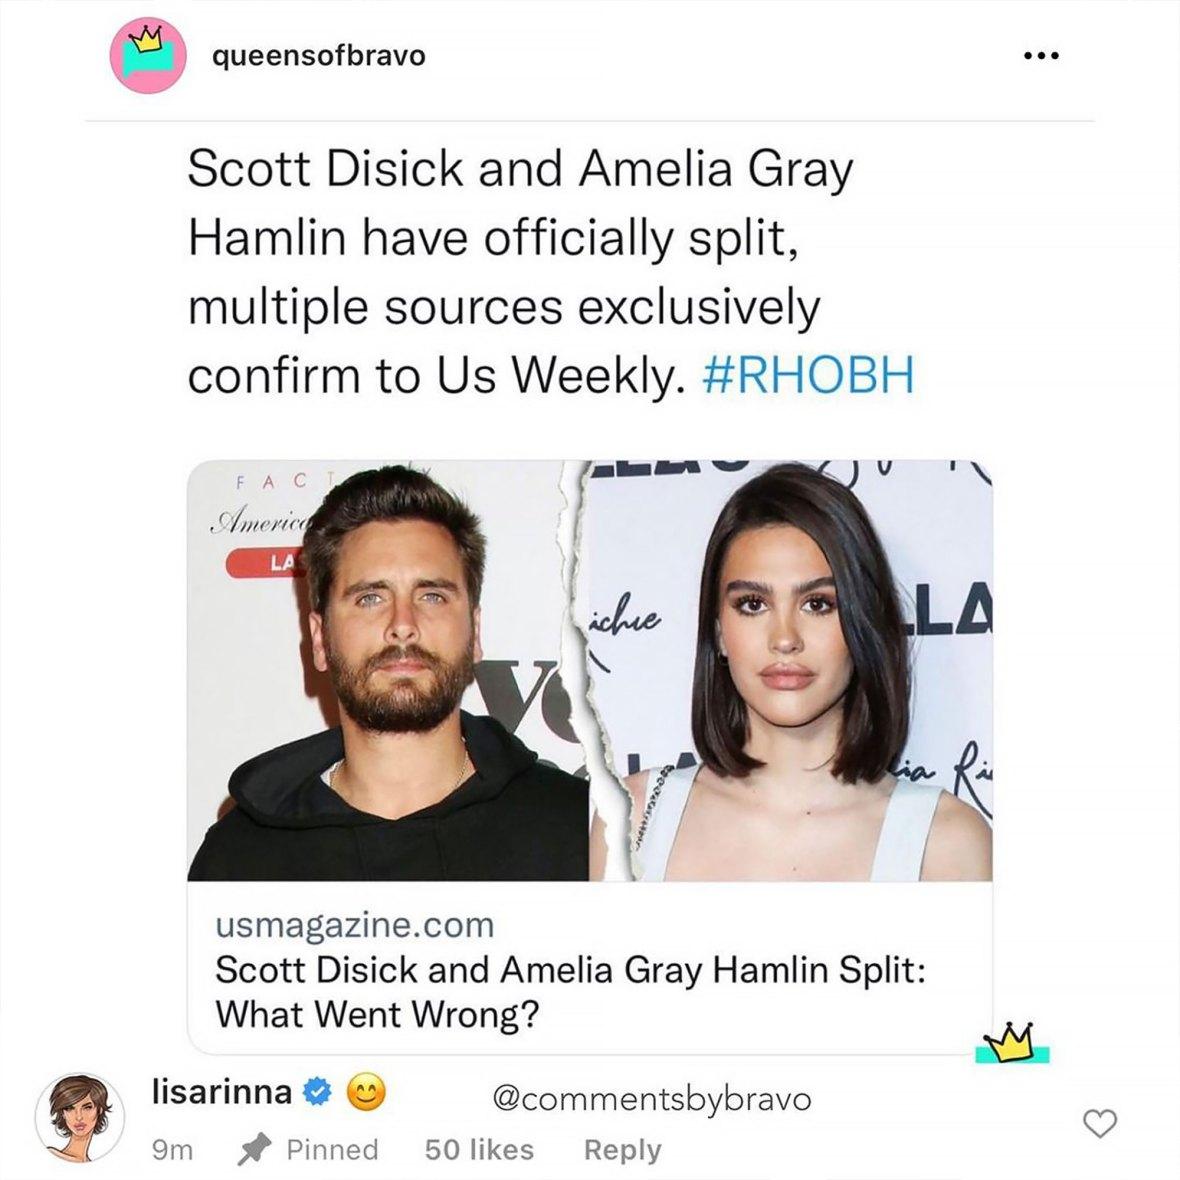 Lisa Rinna Reacts to Split